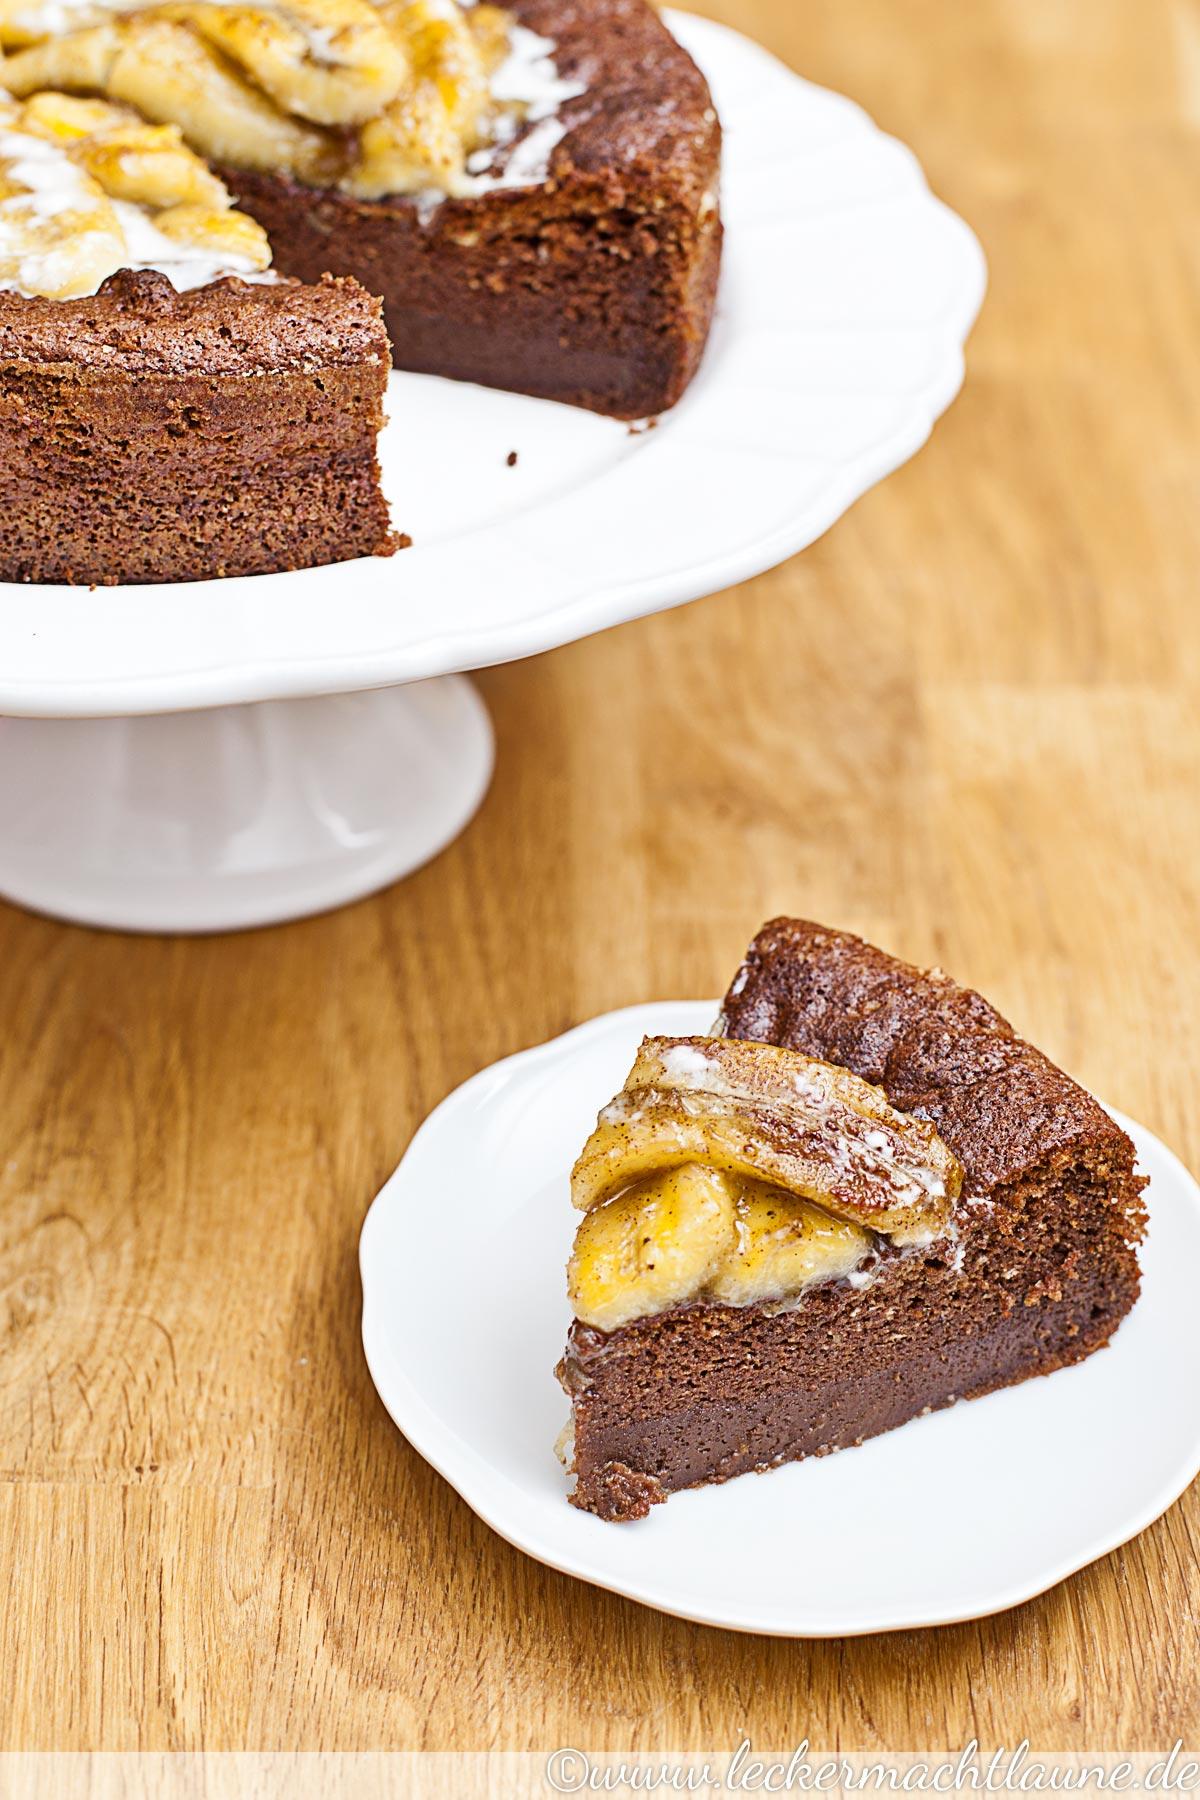 Schoko Kokos Kuchen Mit Karamellisierten Bananen Lecker Macht Laune